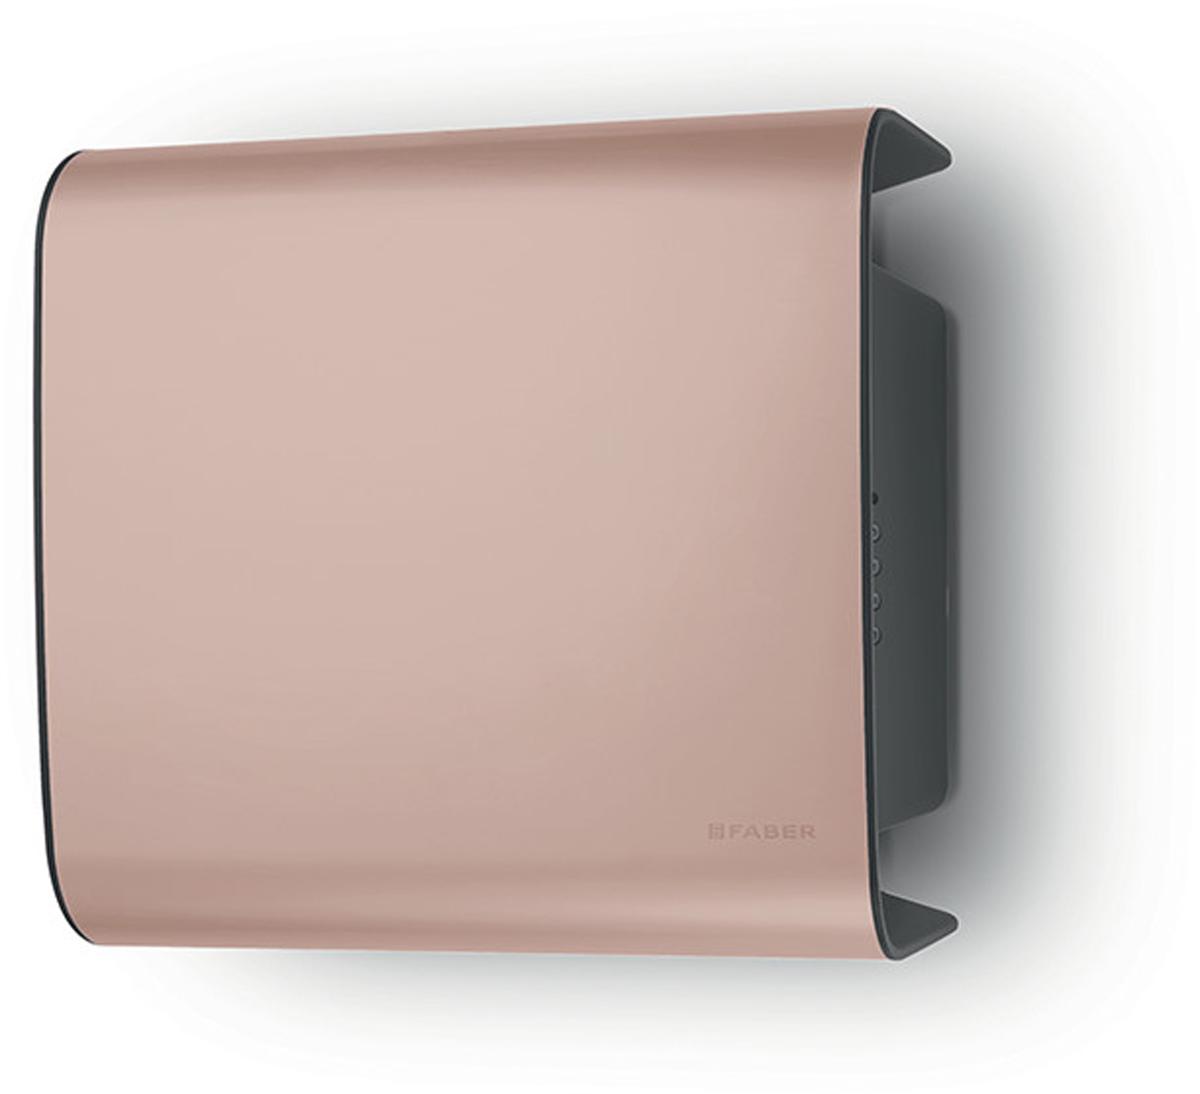 Faber Carre F42, Pink вытяжка110.0324.922